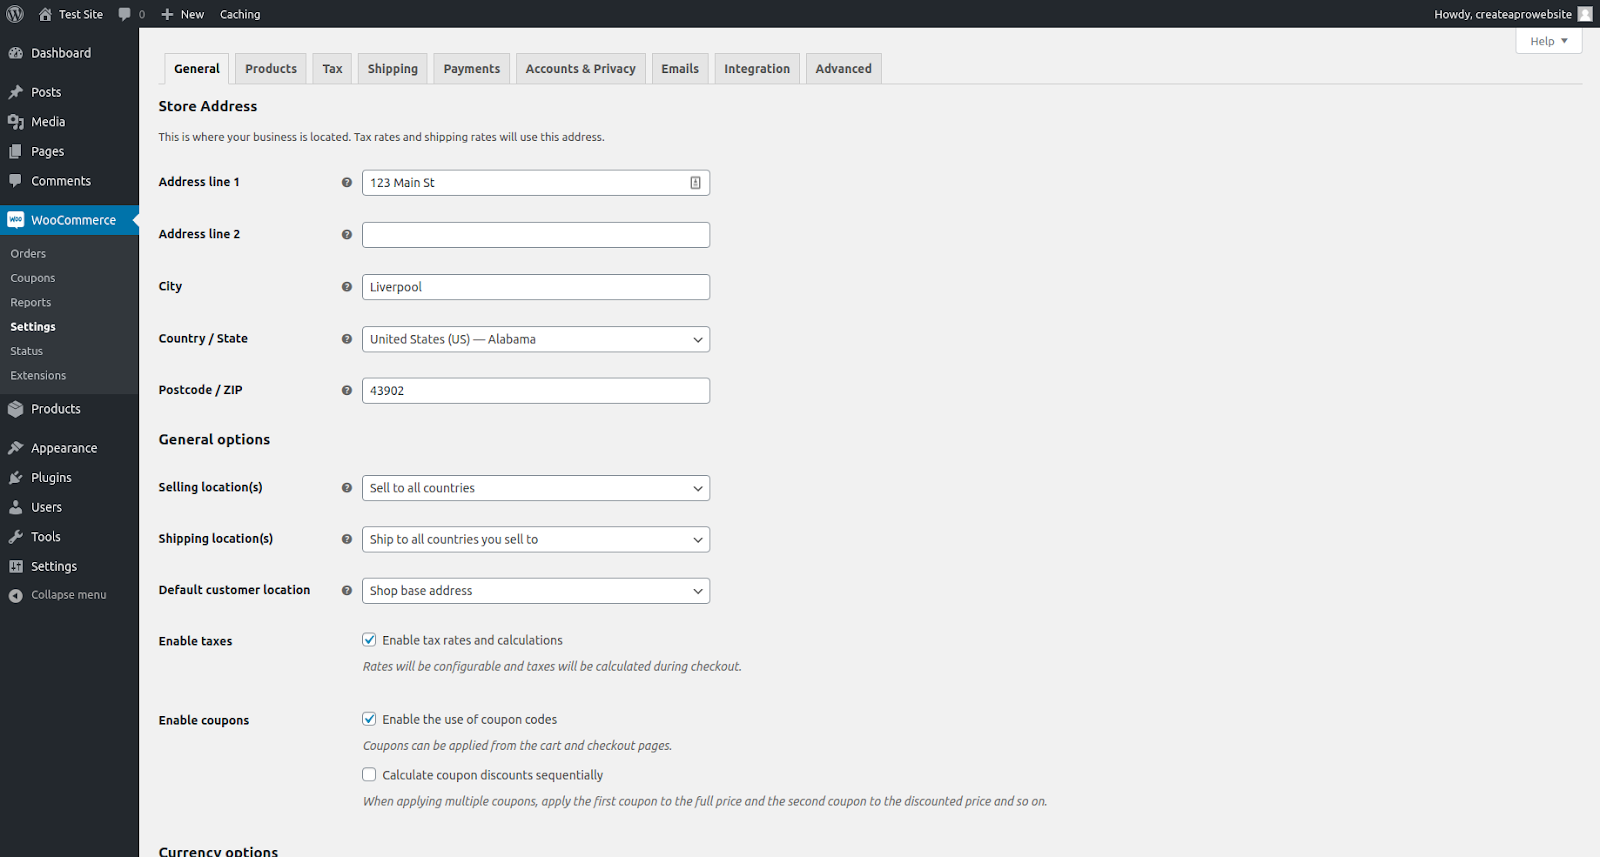 woocommerce wordpress ecommerce plugin features